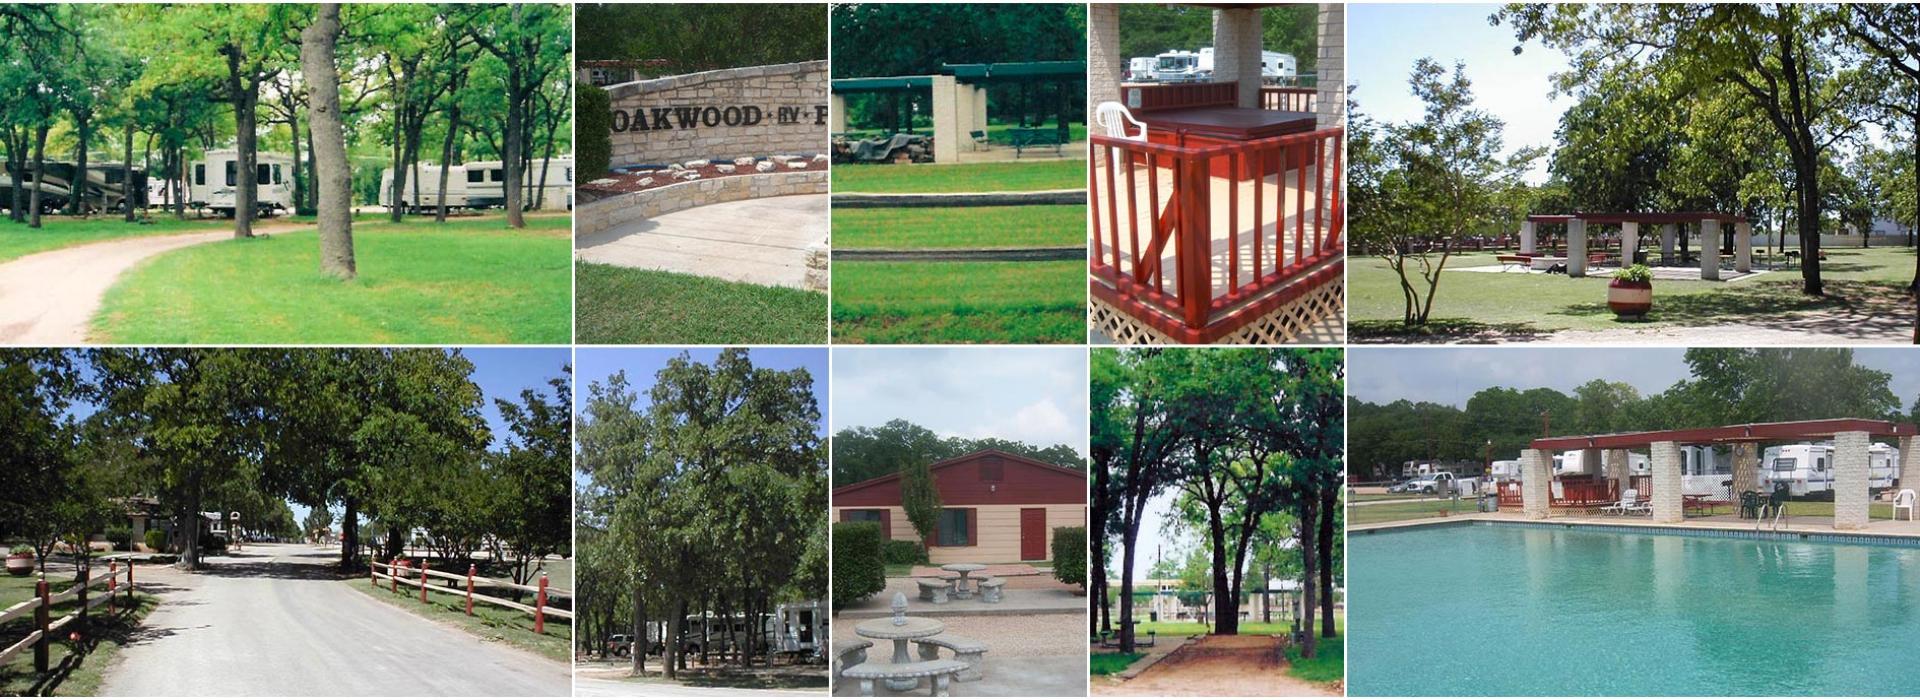 Oakwood RV Resort | Fredericksburg RV Resort | TX 78624